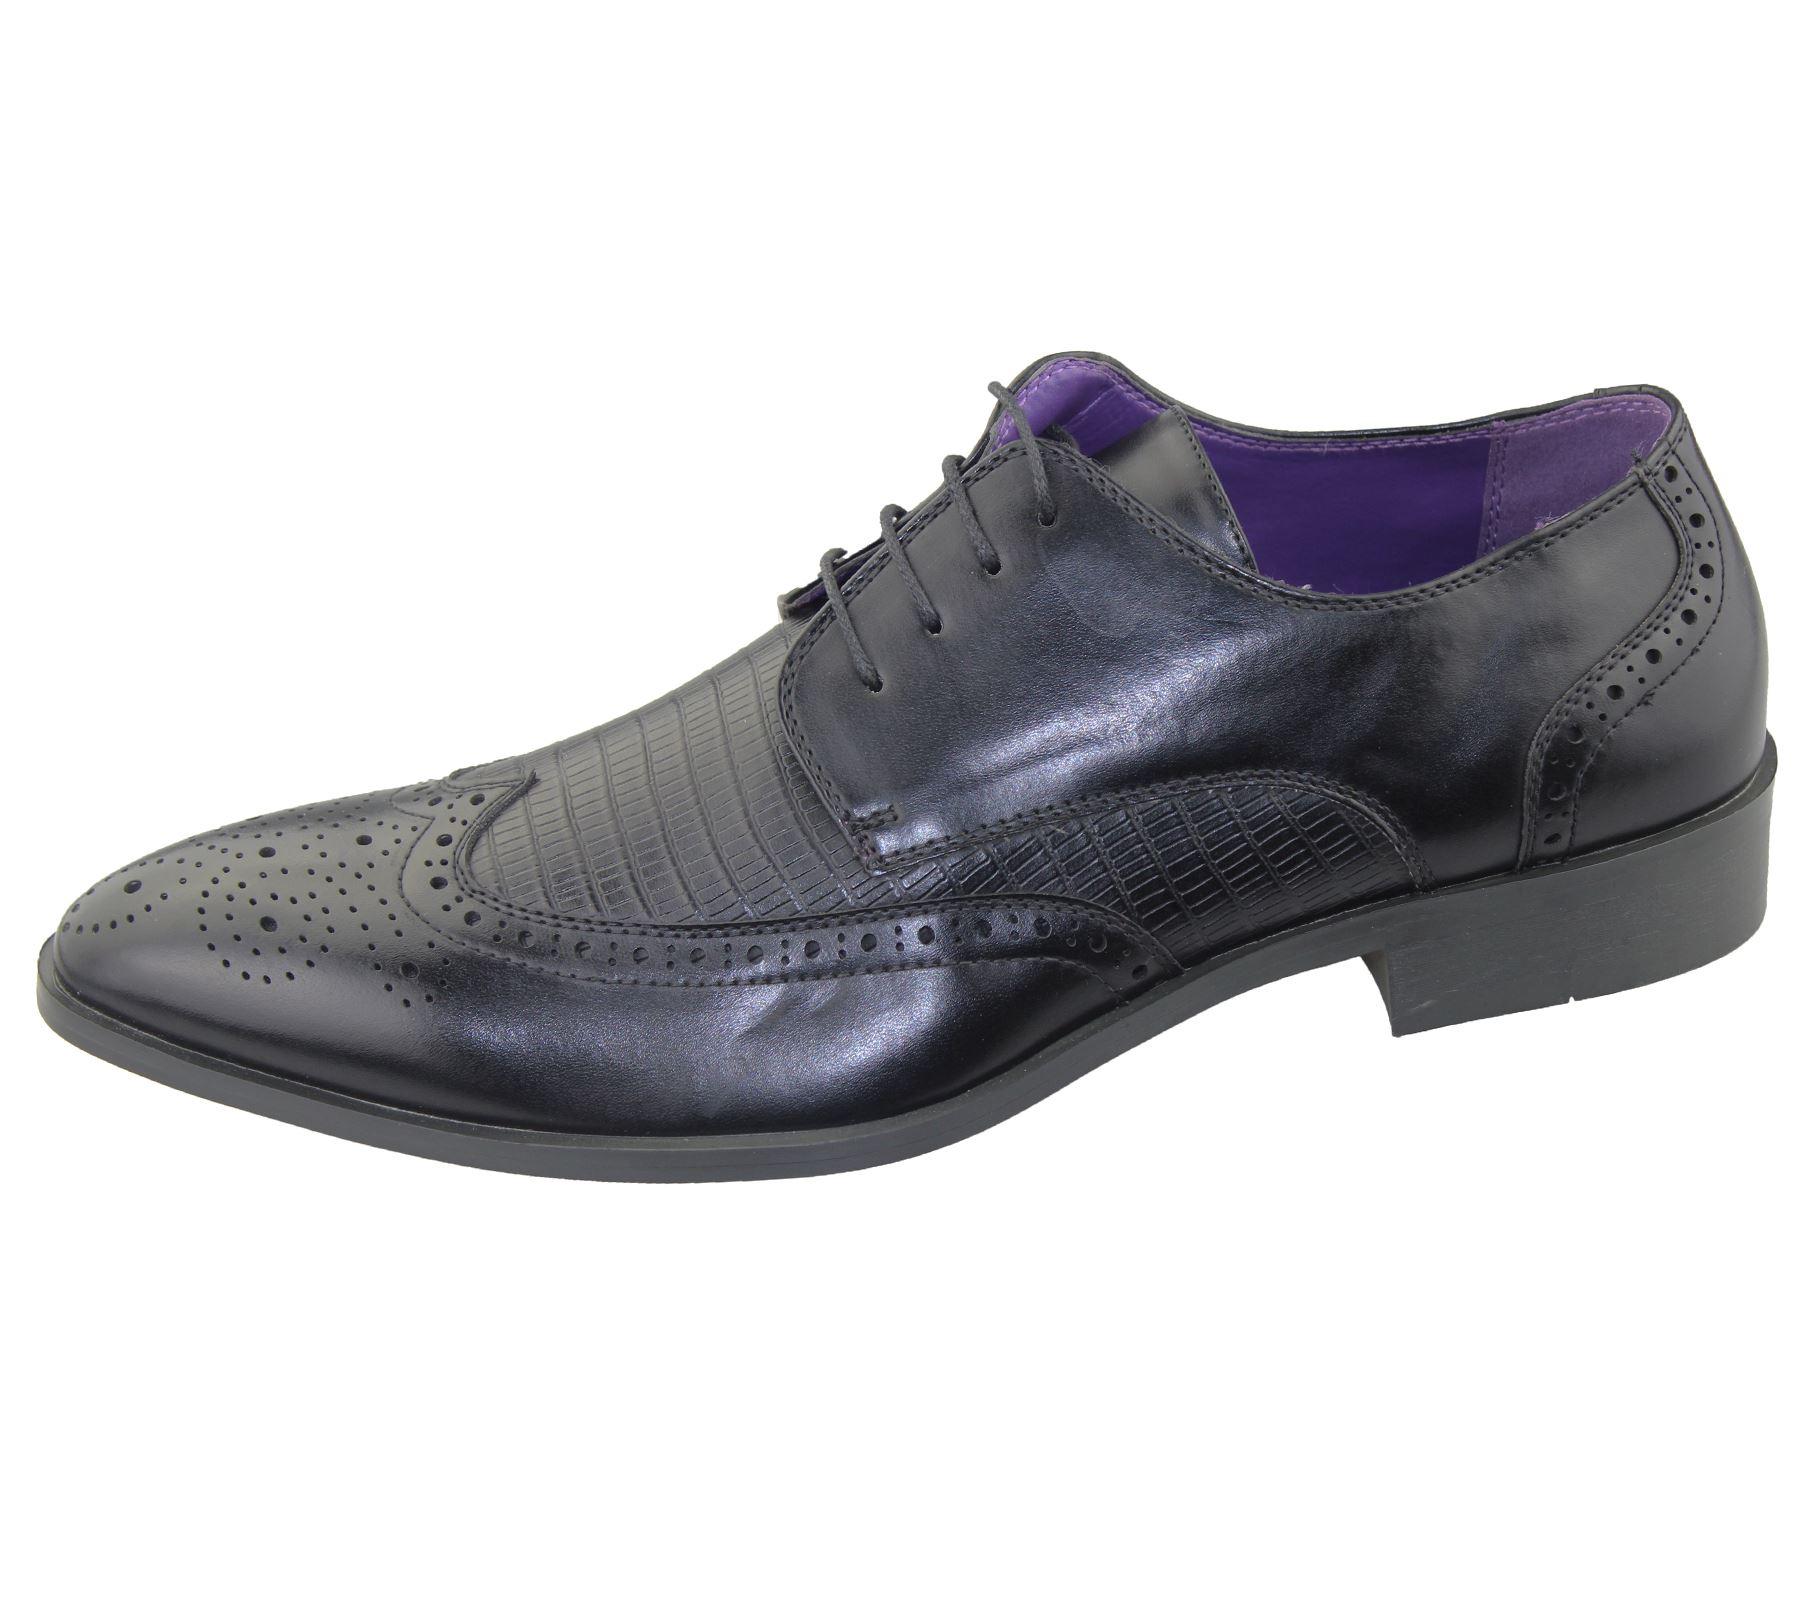 Mens Brogue Shoes fice Wedding Casual Formal Smart Dress